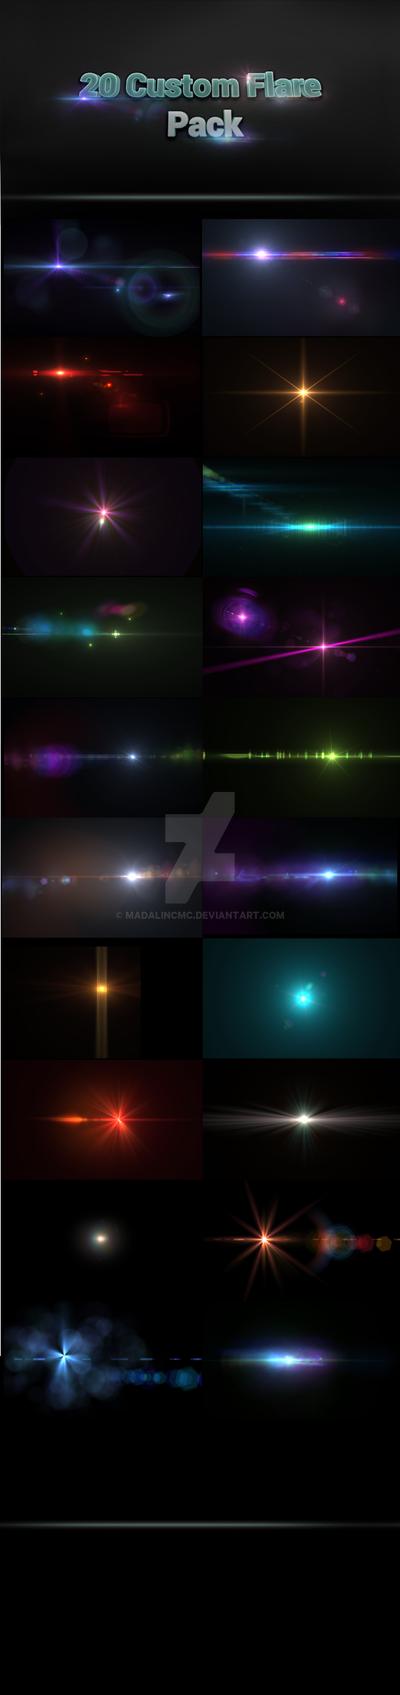 20 Custom Lens Flares Pack by madalincmc